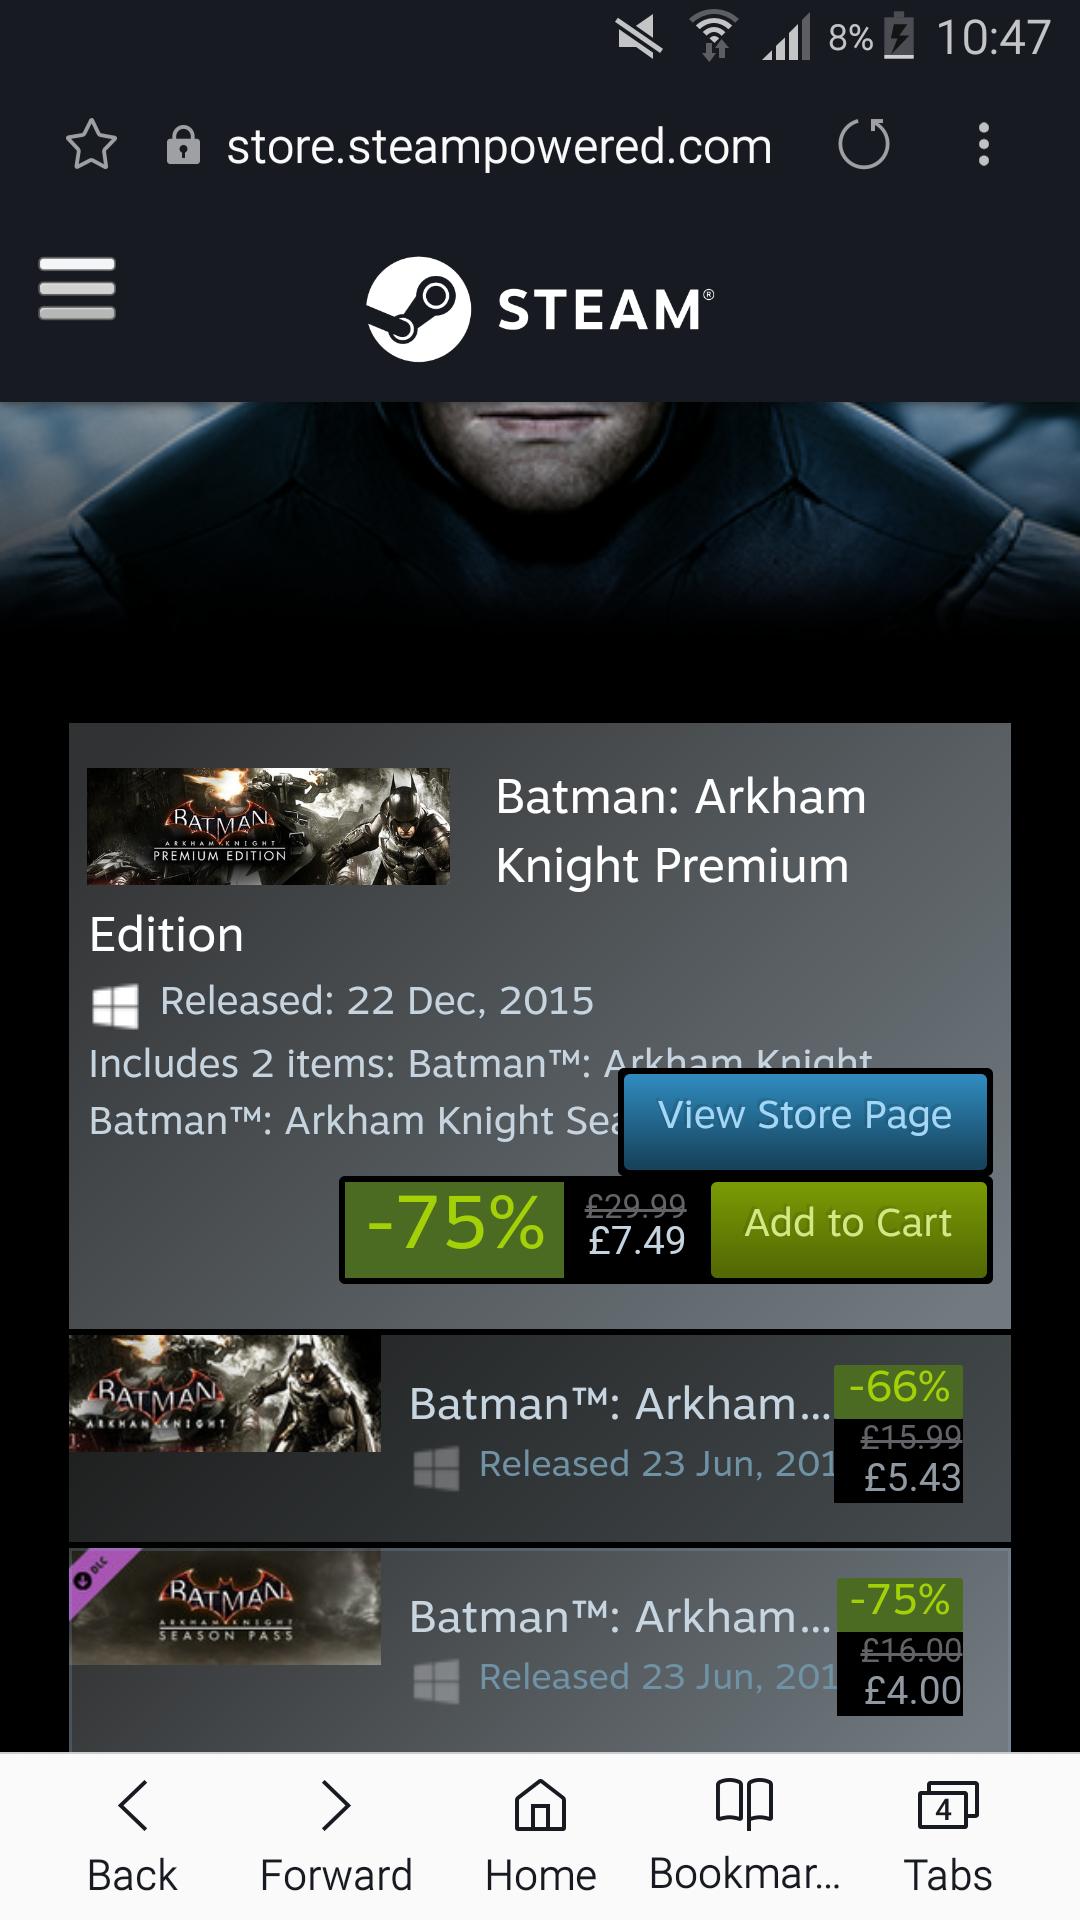 Batman: Arkham Knight Premium Edition £7.49 at Steam